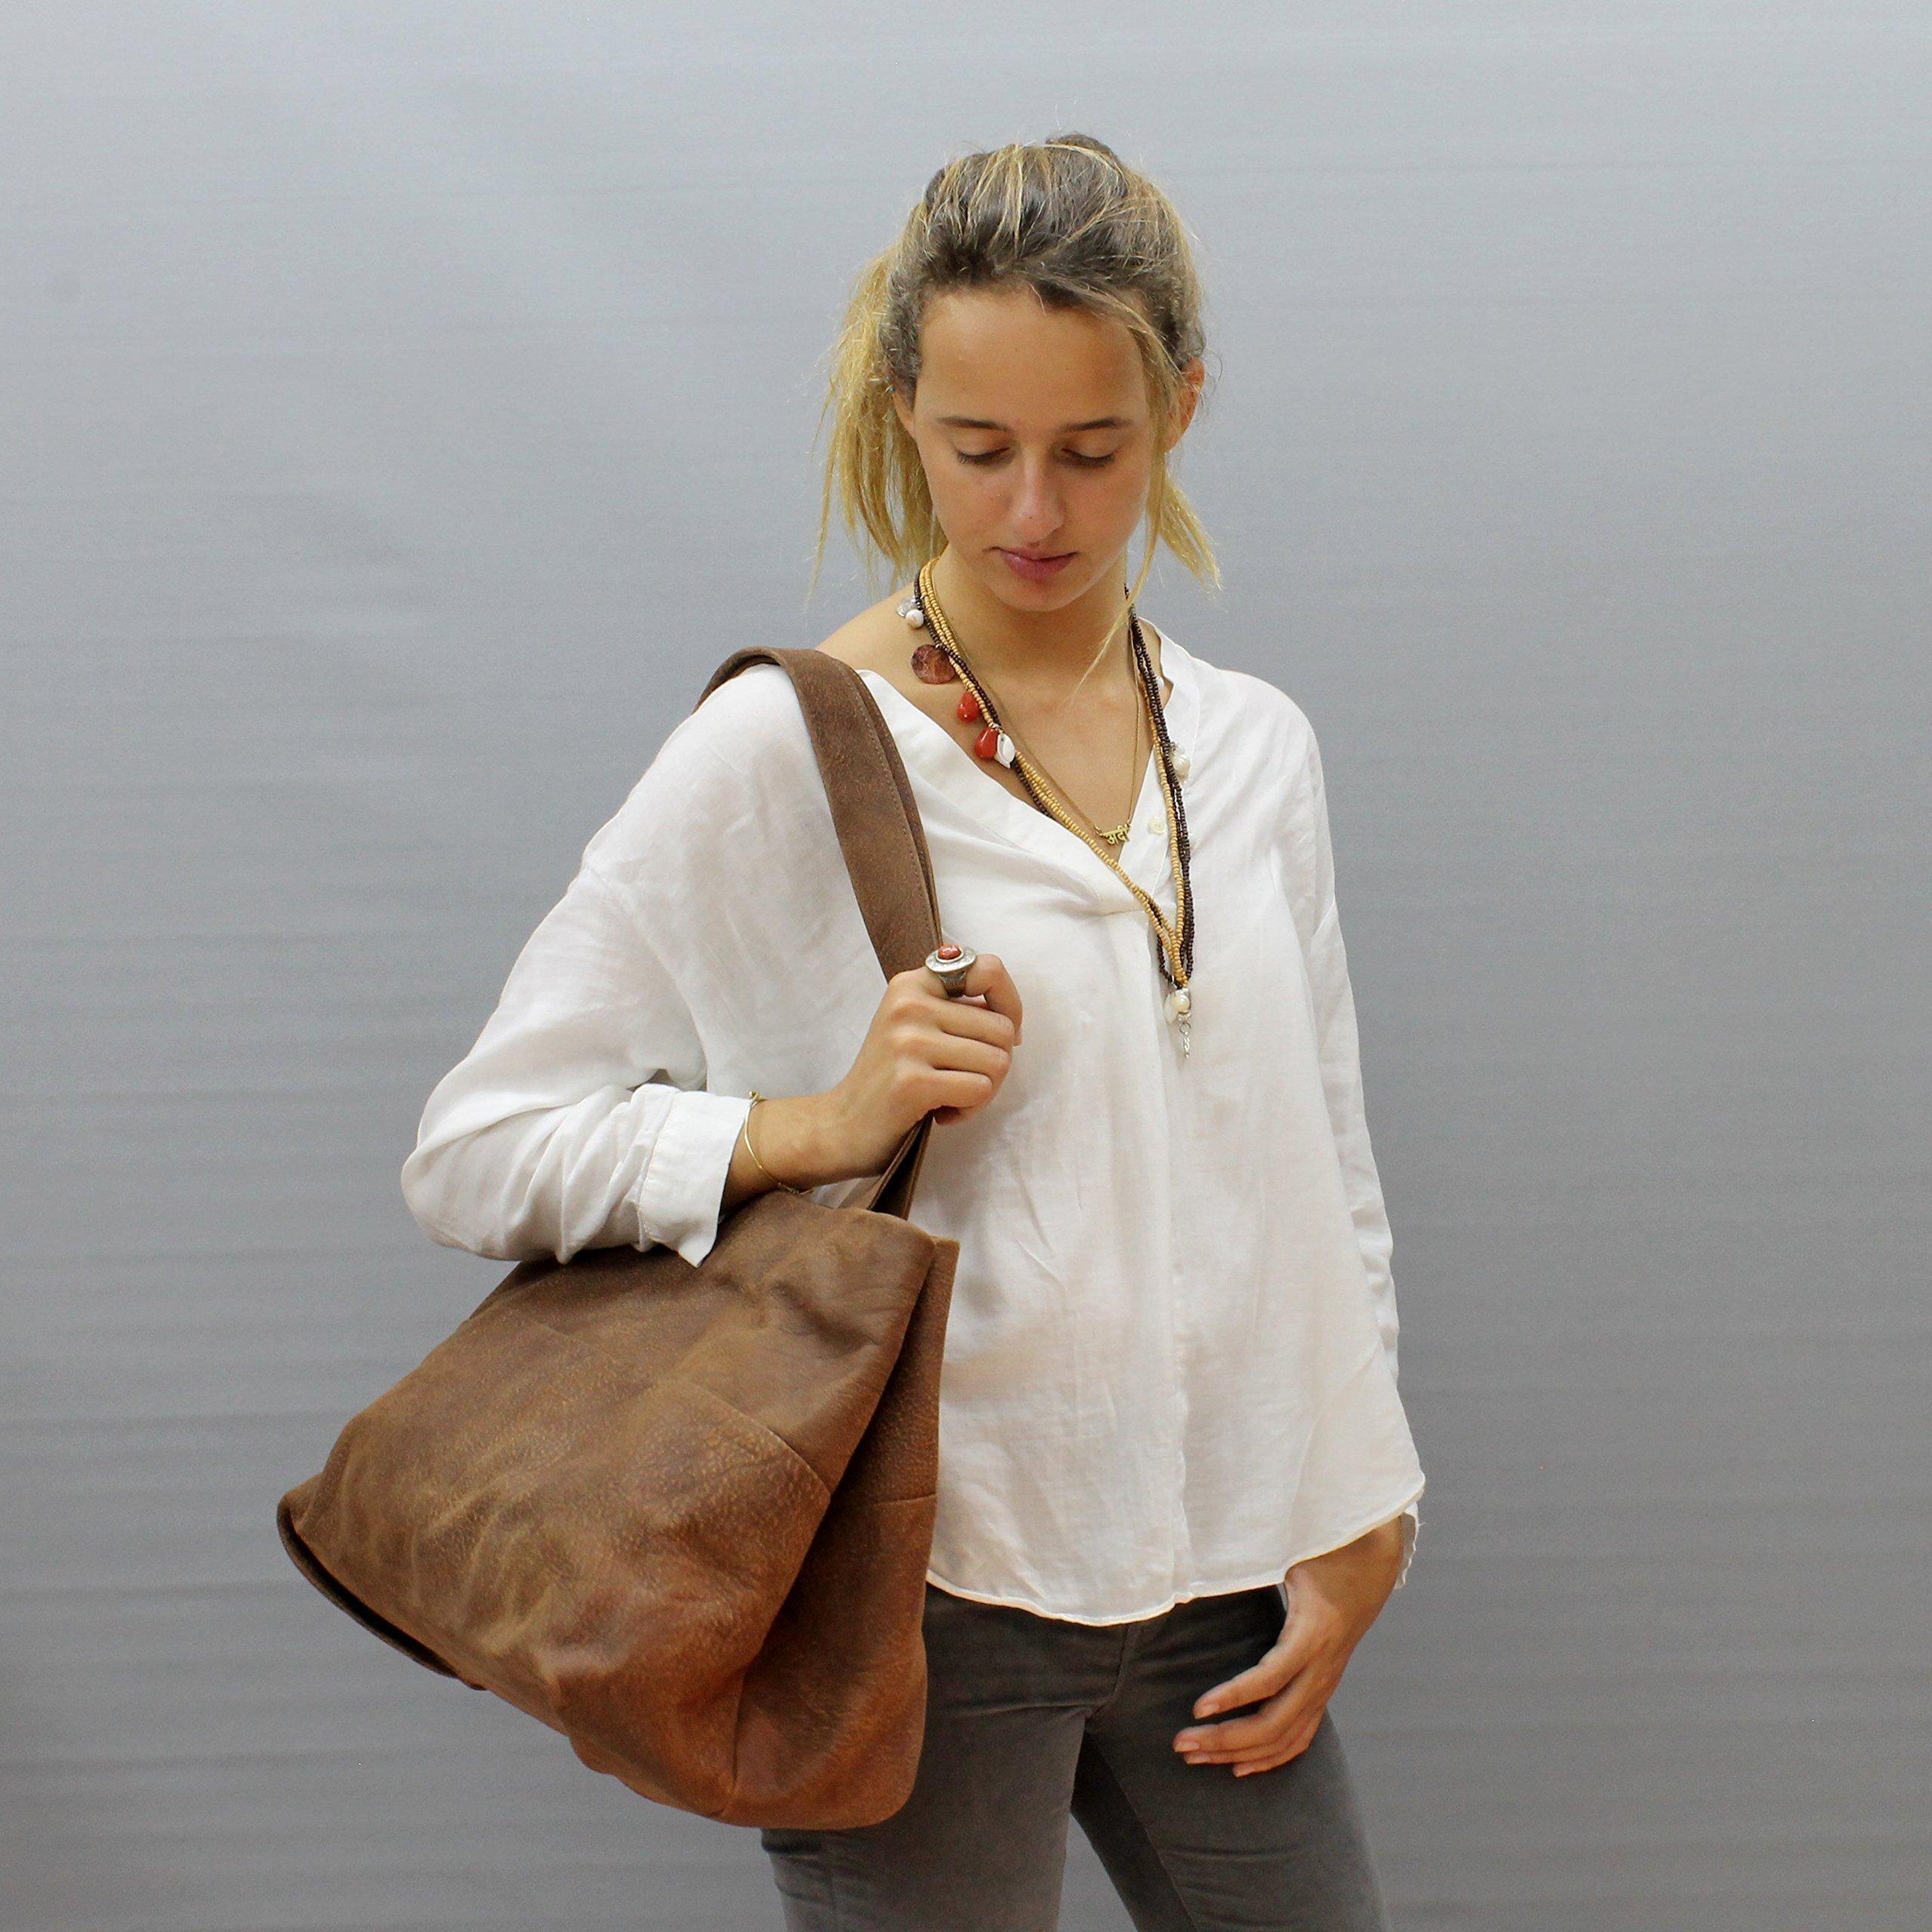 Distressed brown leather bag tote bag Large leather handbag Handmade purse